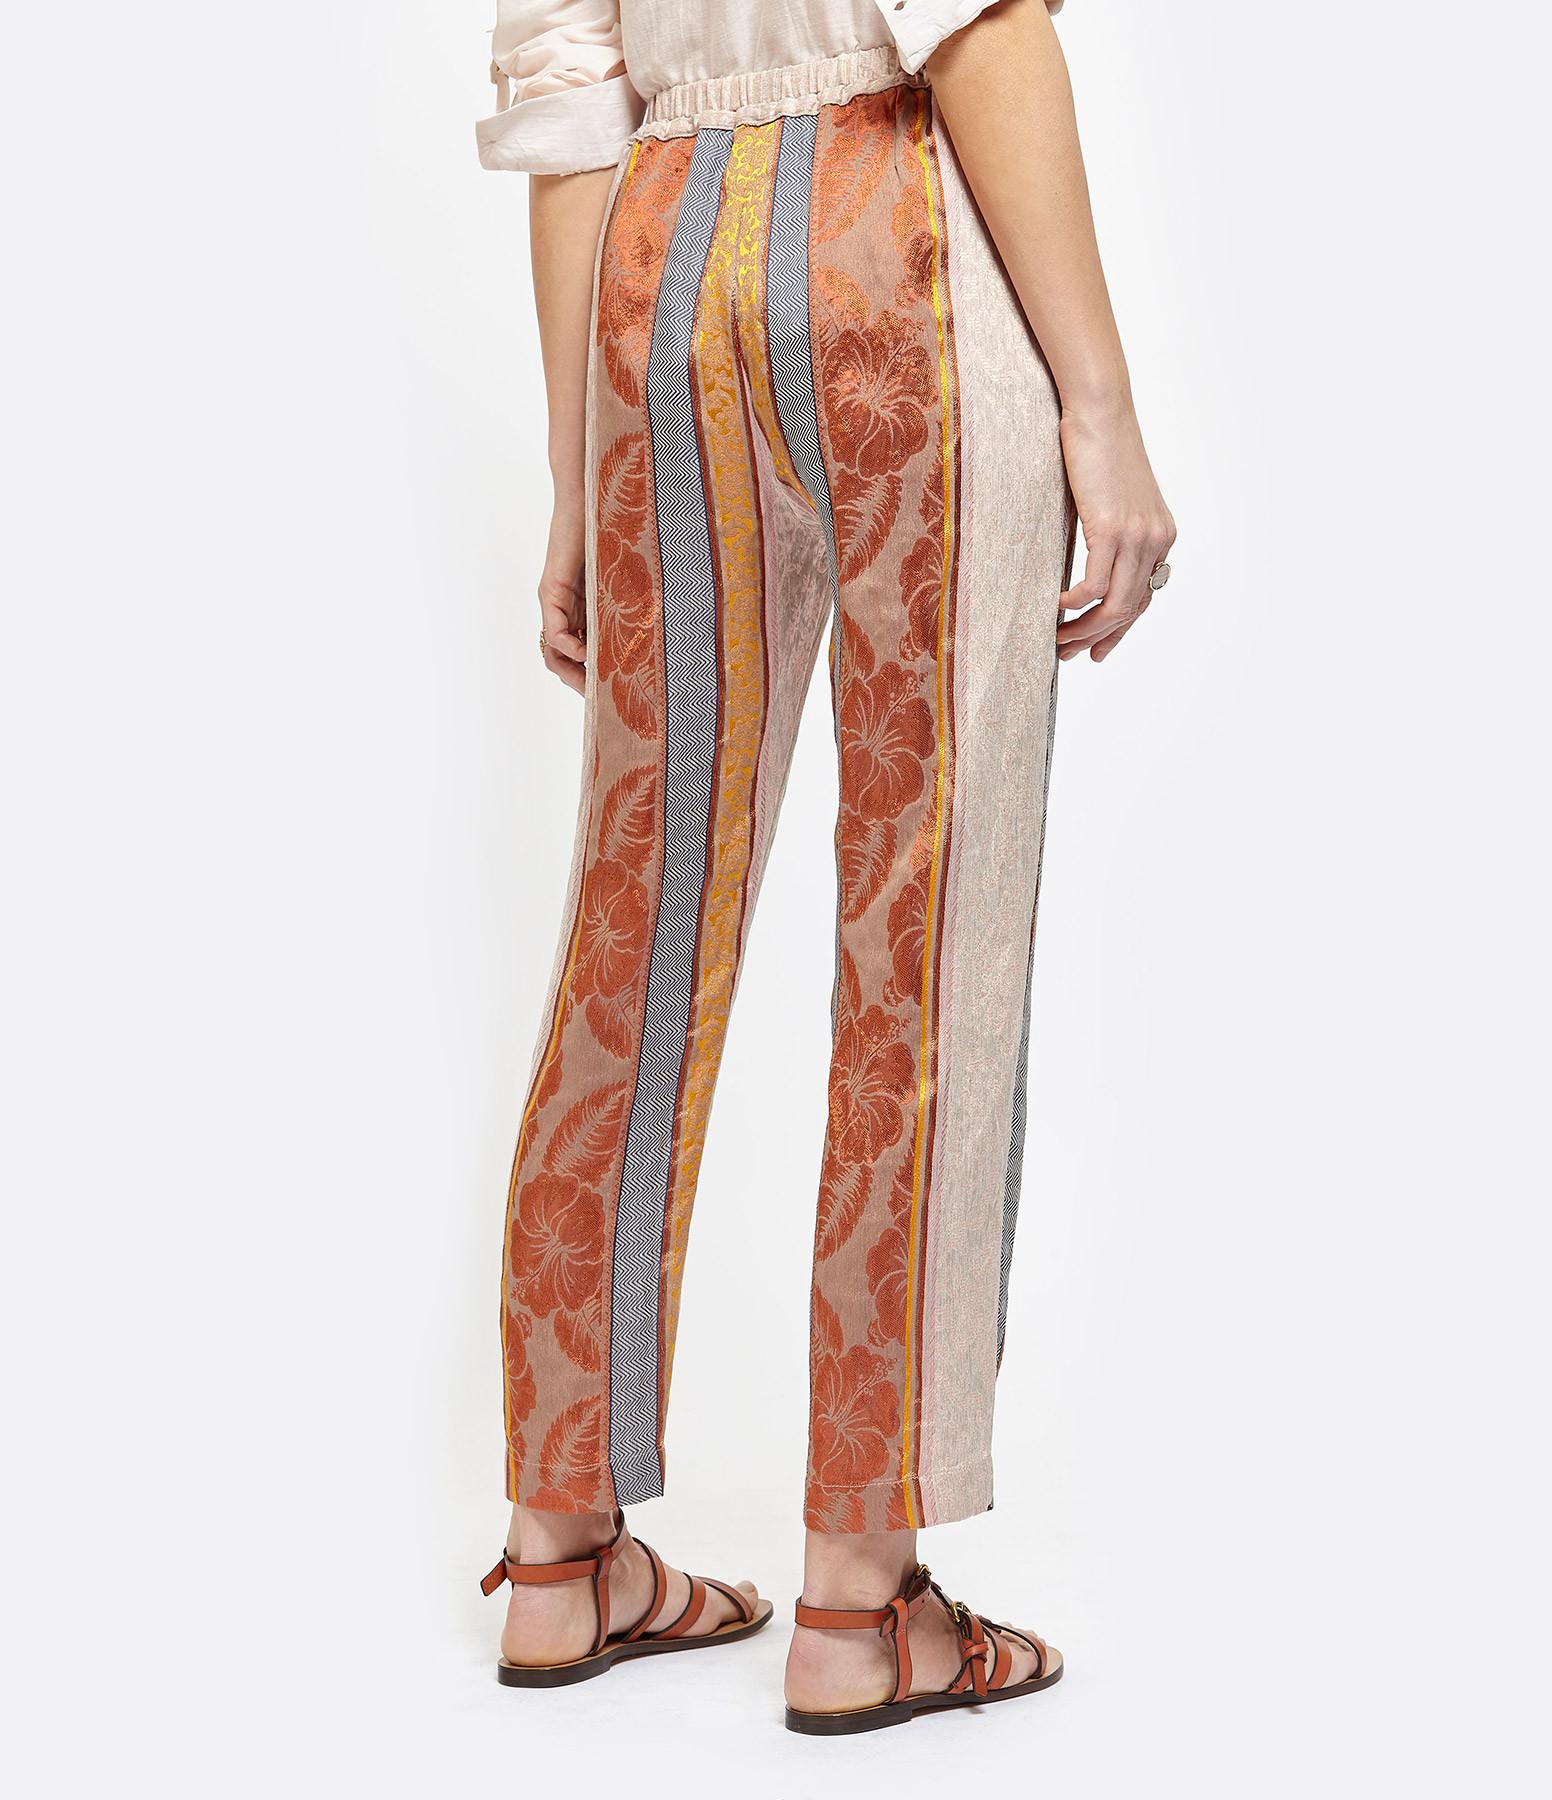 FORTE_FORTE - Pantalon Saint Barth Jacquard Terracotta